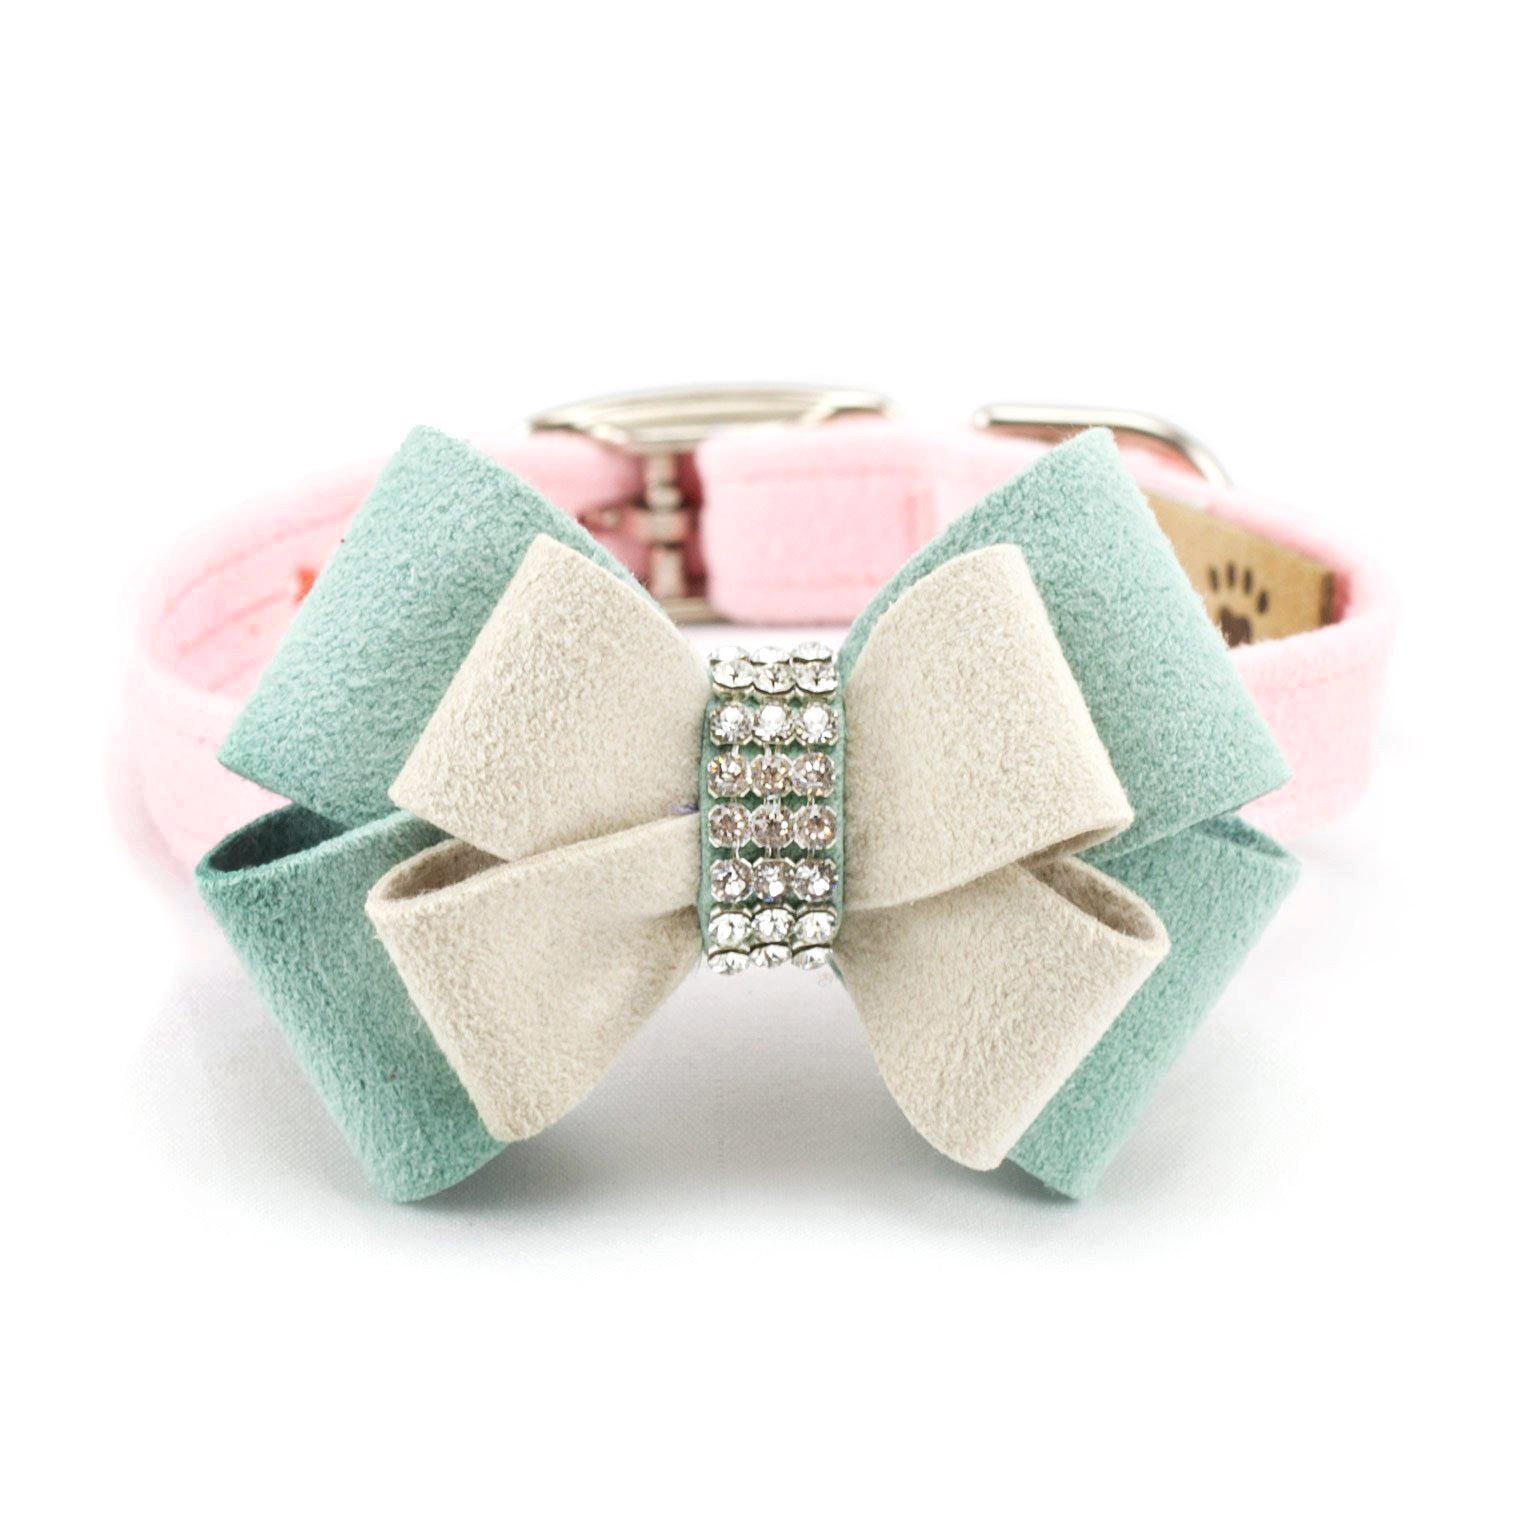 Hope Bow Luxury Dog Collar by Susan Lanci - Puppy Pink